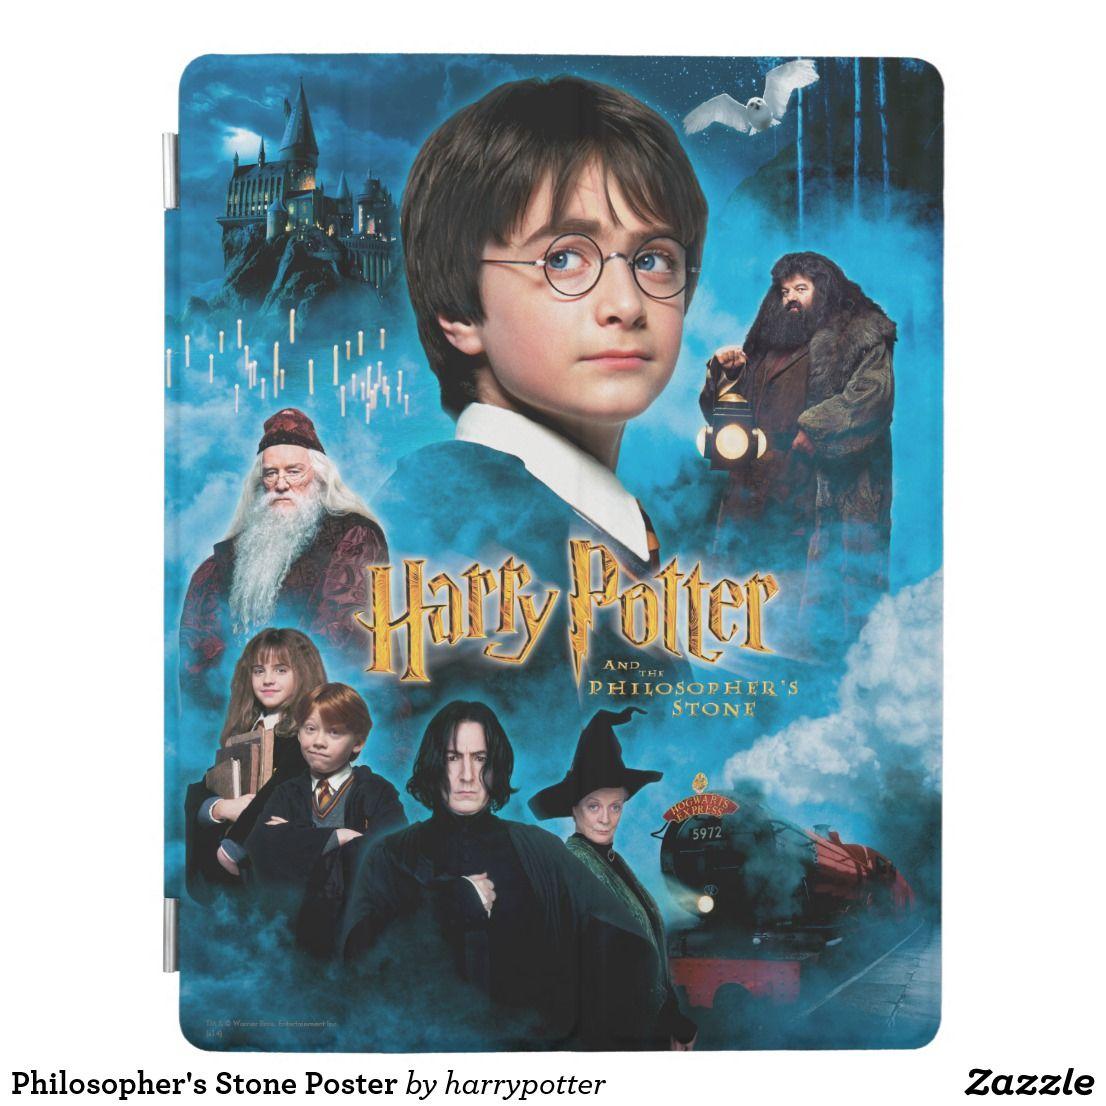 Philosopher S Stone Poster Ipad Smart Cover Zazzle Com Peliculas De Harry Potter Harry Potter Y La Piedra Filosofal Protagonista De Harry Potter